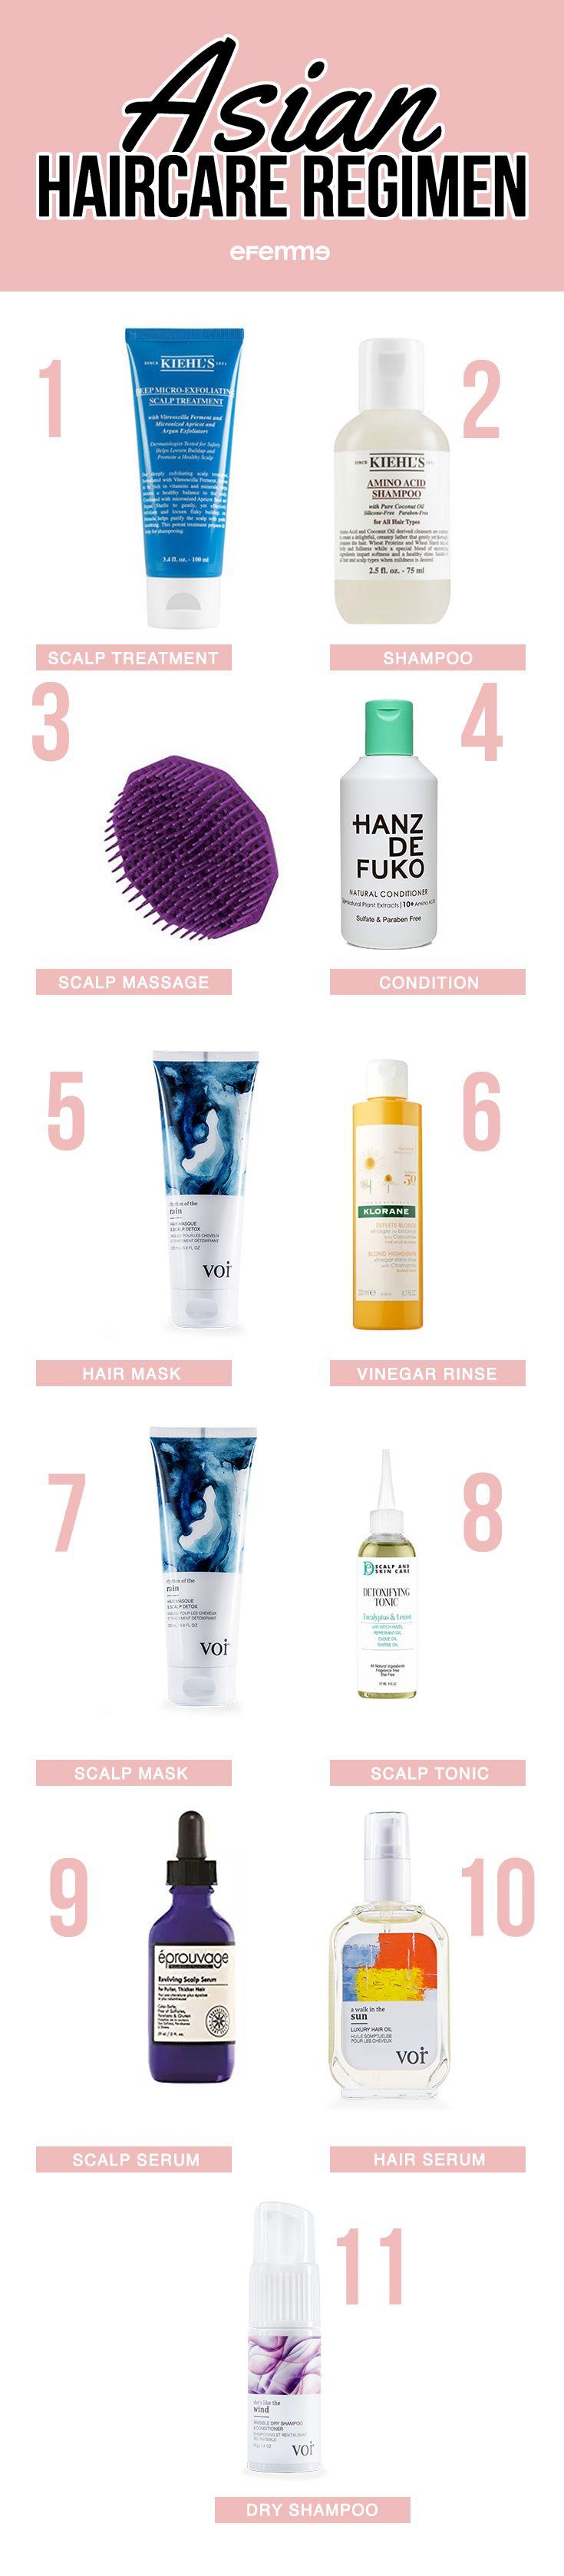 Asian Hair Care Regimen 1 - Scalp Treatment (x1 Week) 2 - Shampoo 3 - Scalp Massage 4 - Condition 5 - Hair Mask (x1 Week) 6 - Vinegar Rinse (x1 Week) 7 - Scalp Mask (x1 Week) 8 - Scalp Tonic 9 - Scalp Serum 10 - Hair Serum 11 - Dry Shampoo (+Day Old Hair) #hair #haircare #korean #regimen #routine #beauty #hairtips #howto #blog #blogger #hairstyle